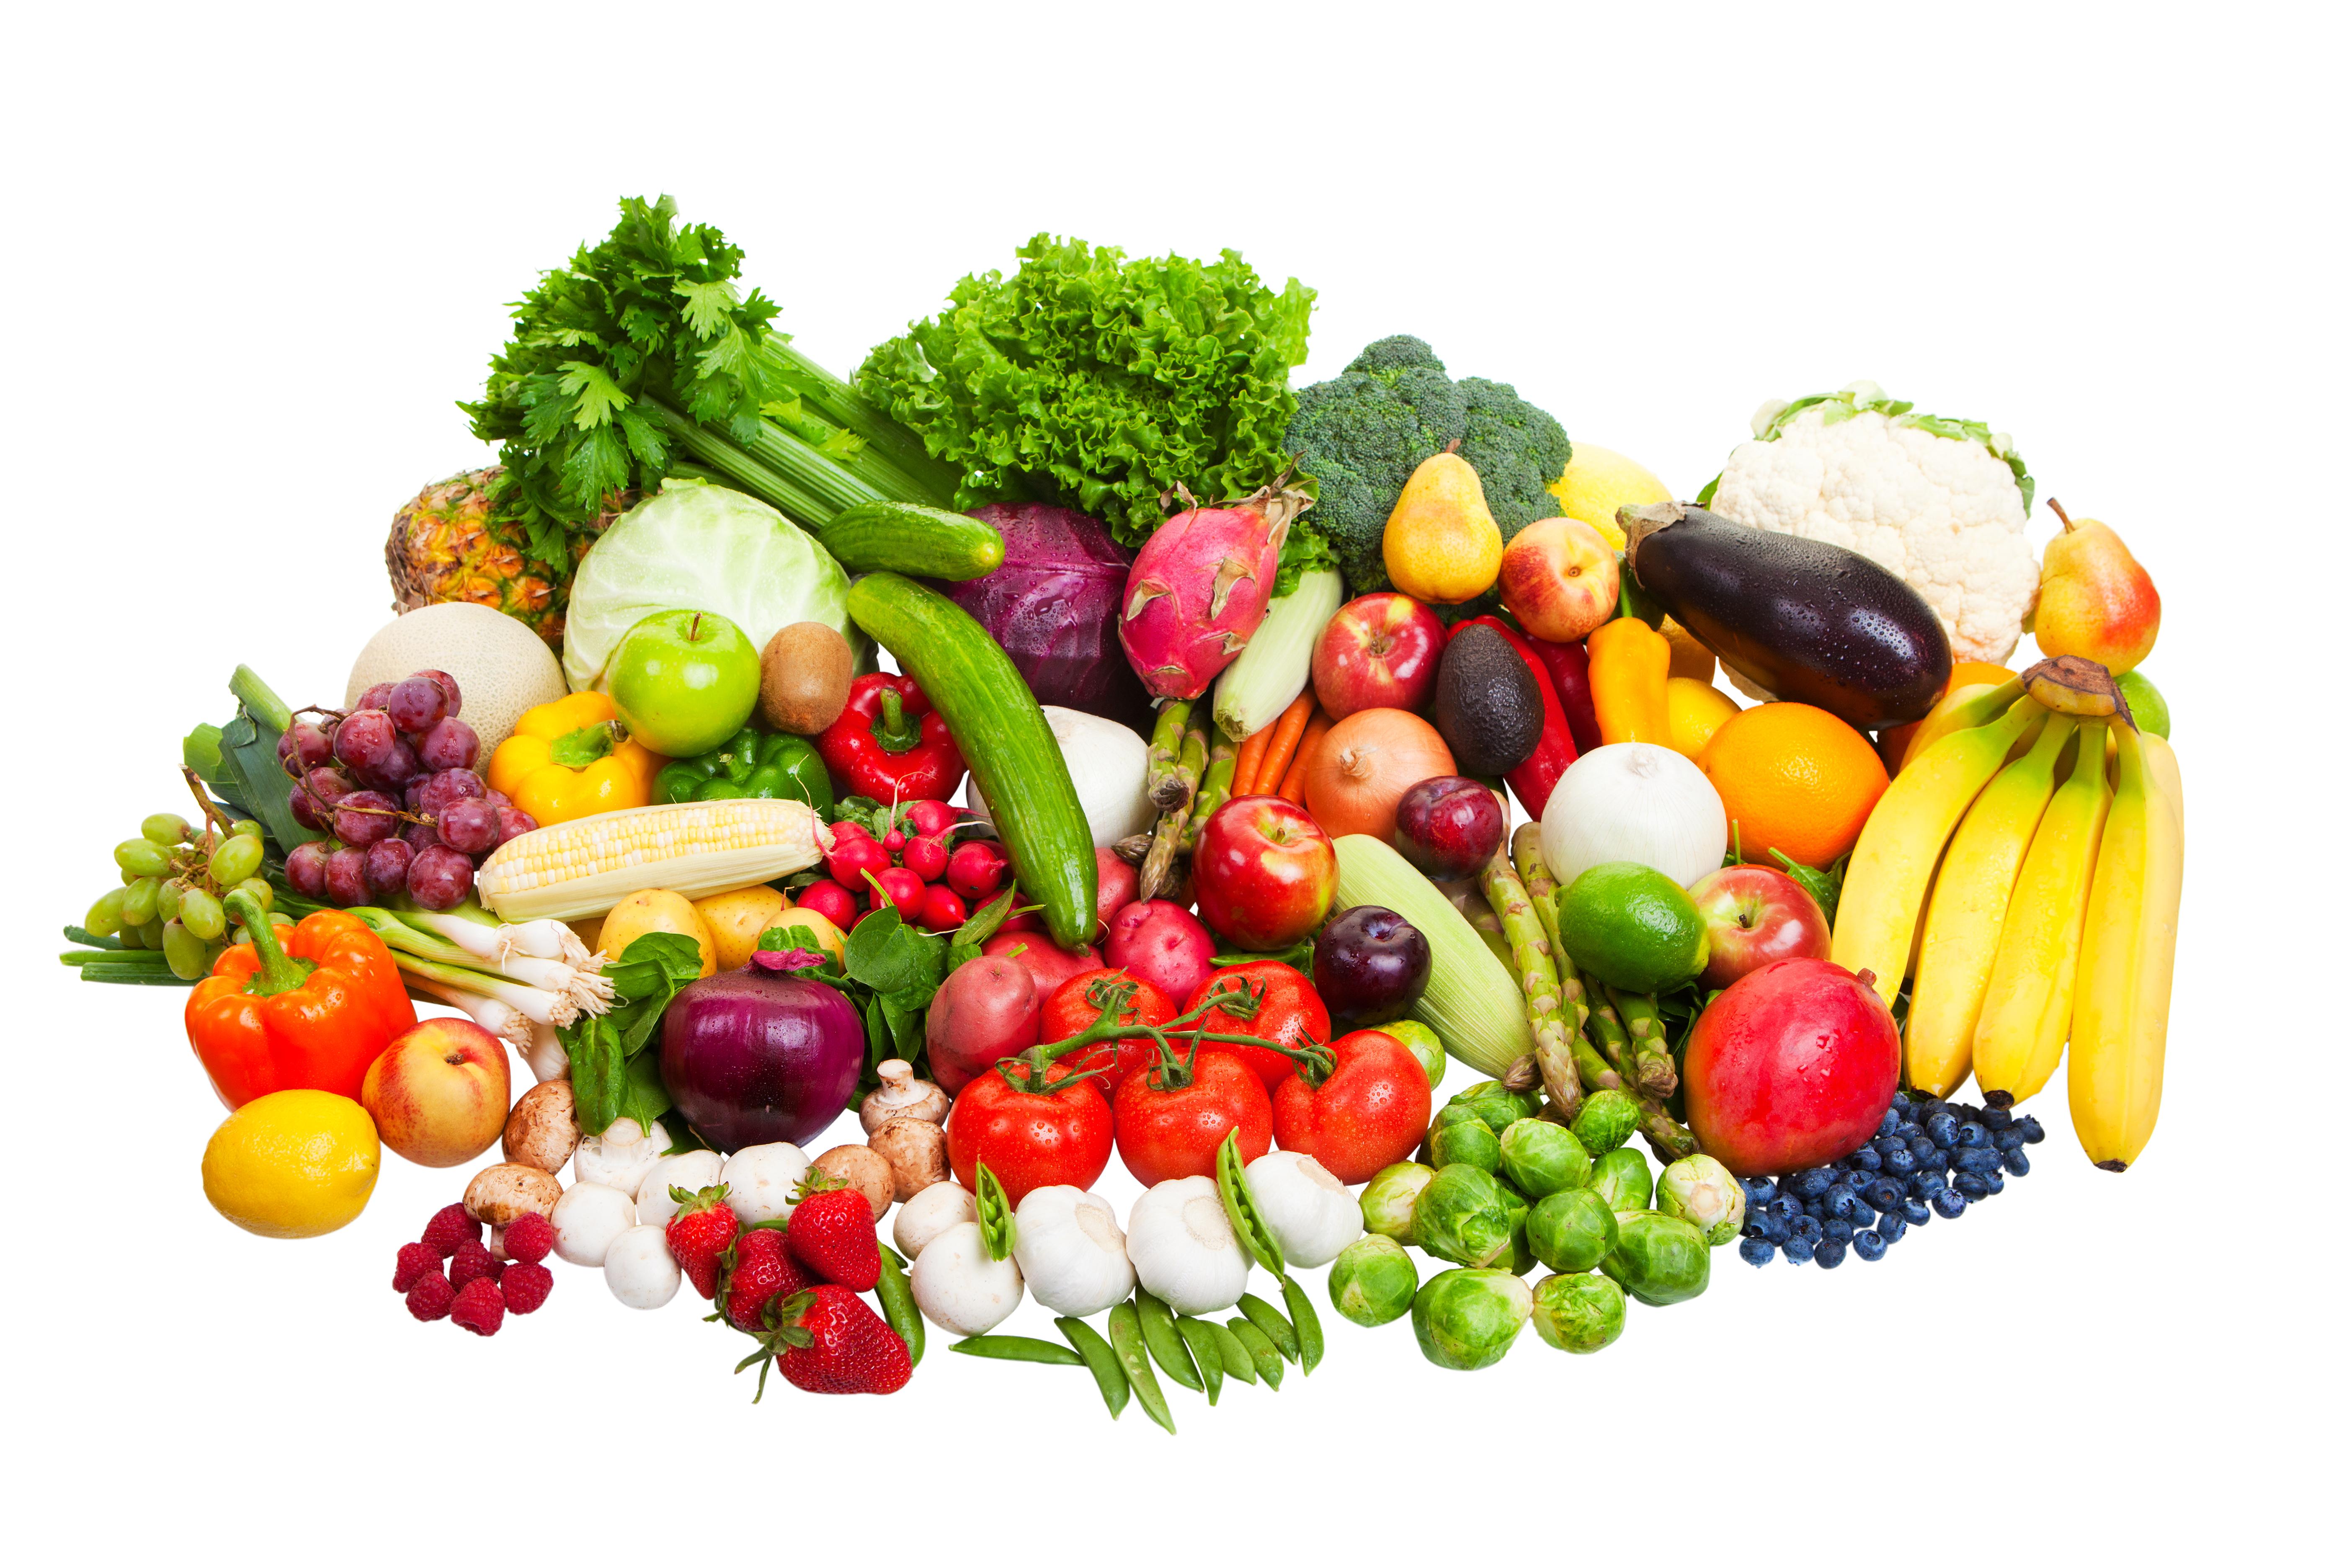 p-02-assorted-fruits-vegetables.jpg